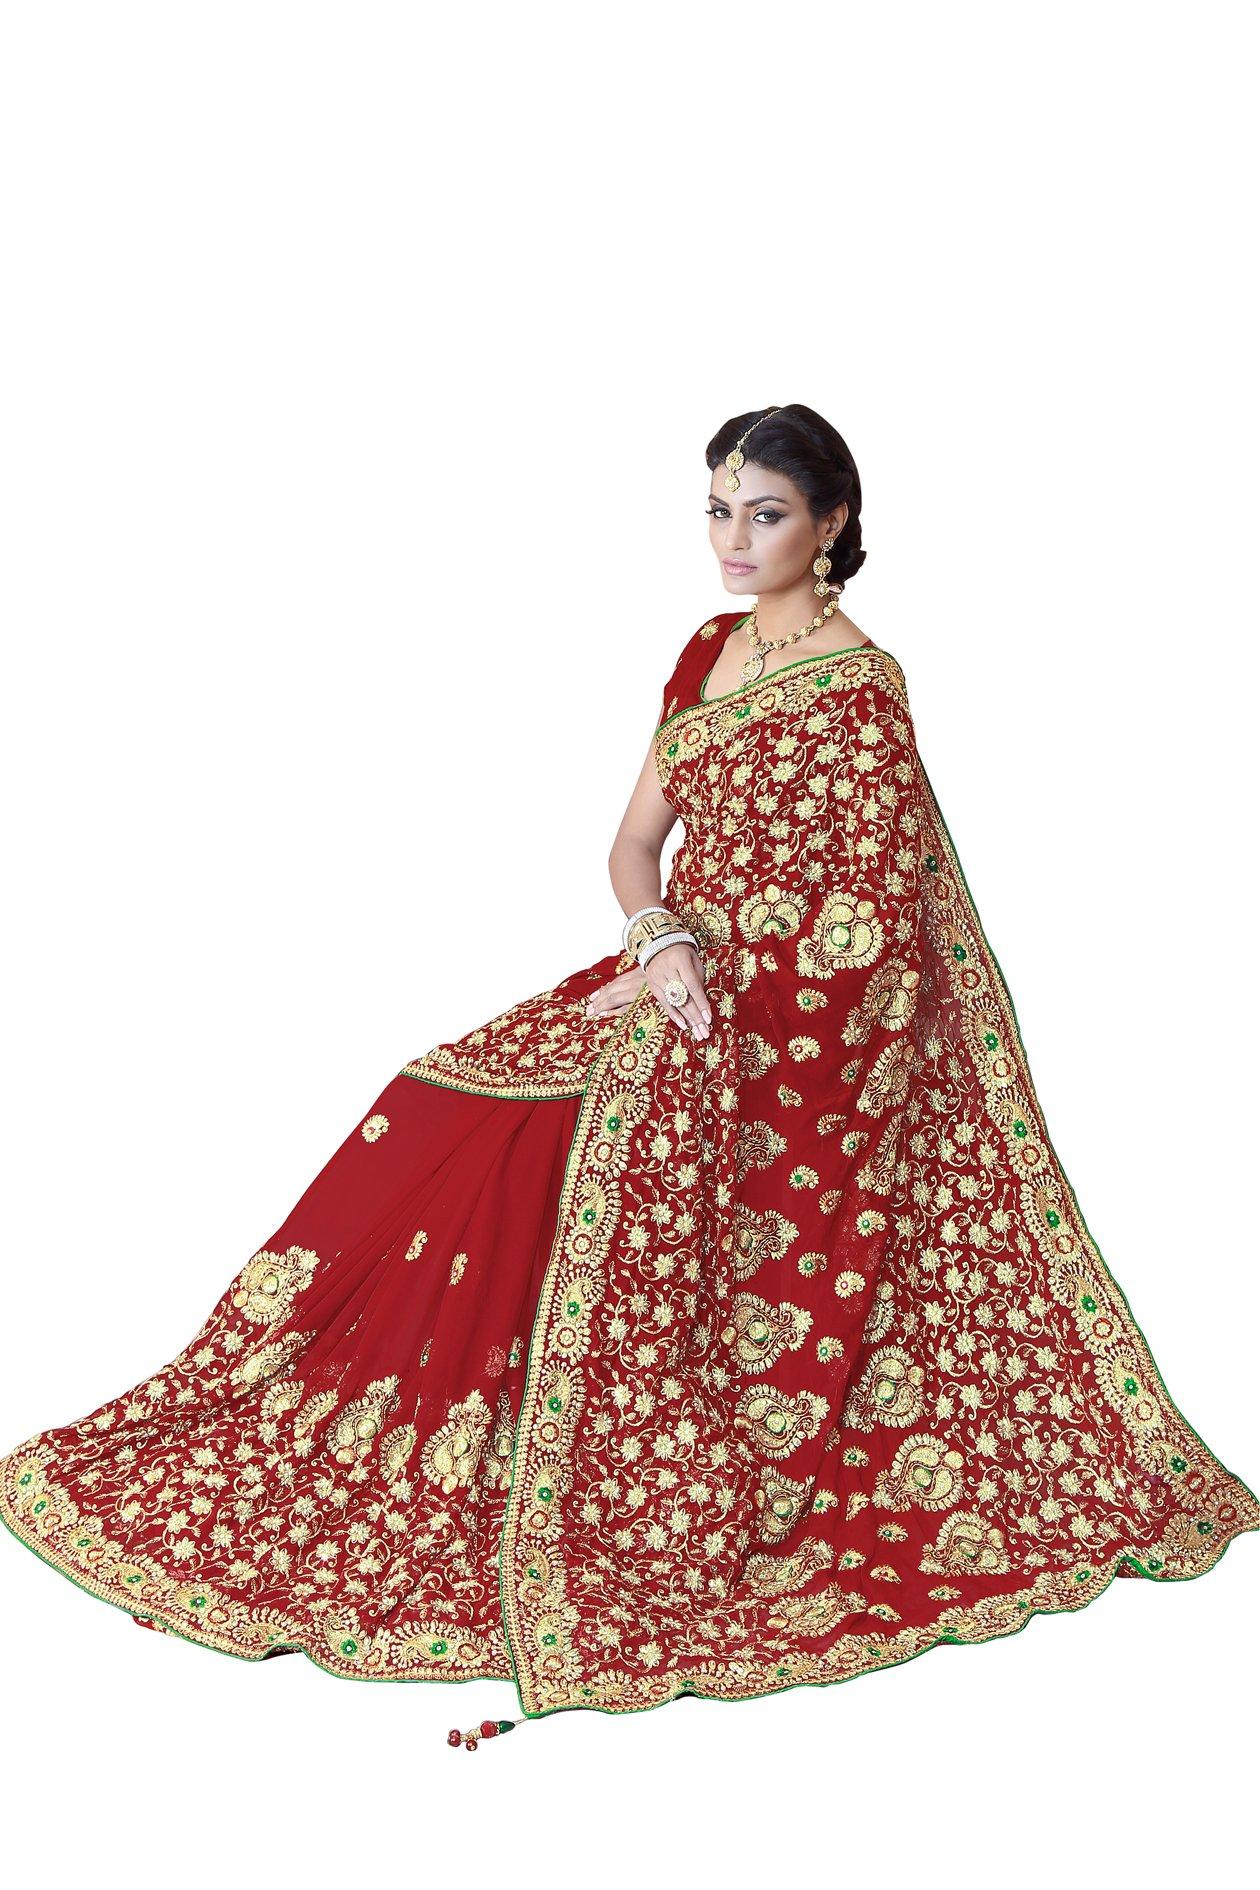 Sourbh Women FauxGeorgette Bridal Wedding Saree Mirchi Fashion Indian Sari(5243_Red)